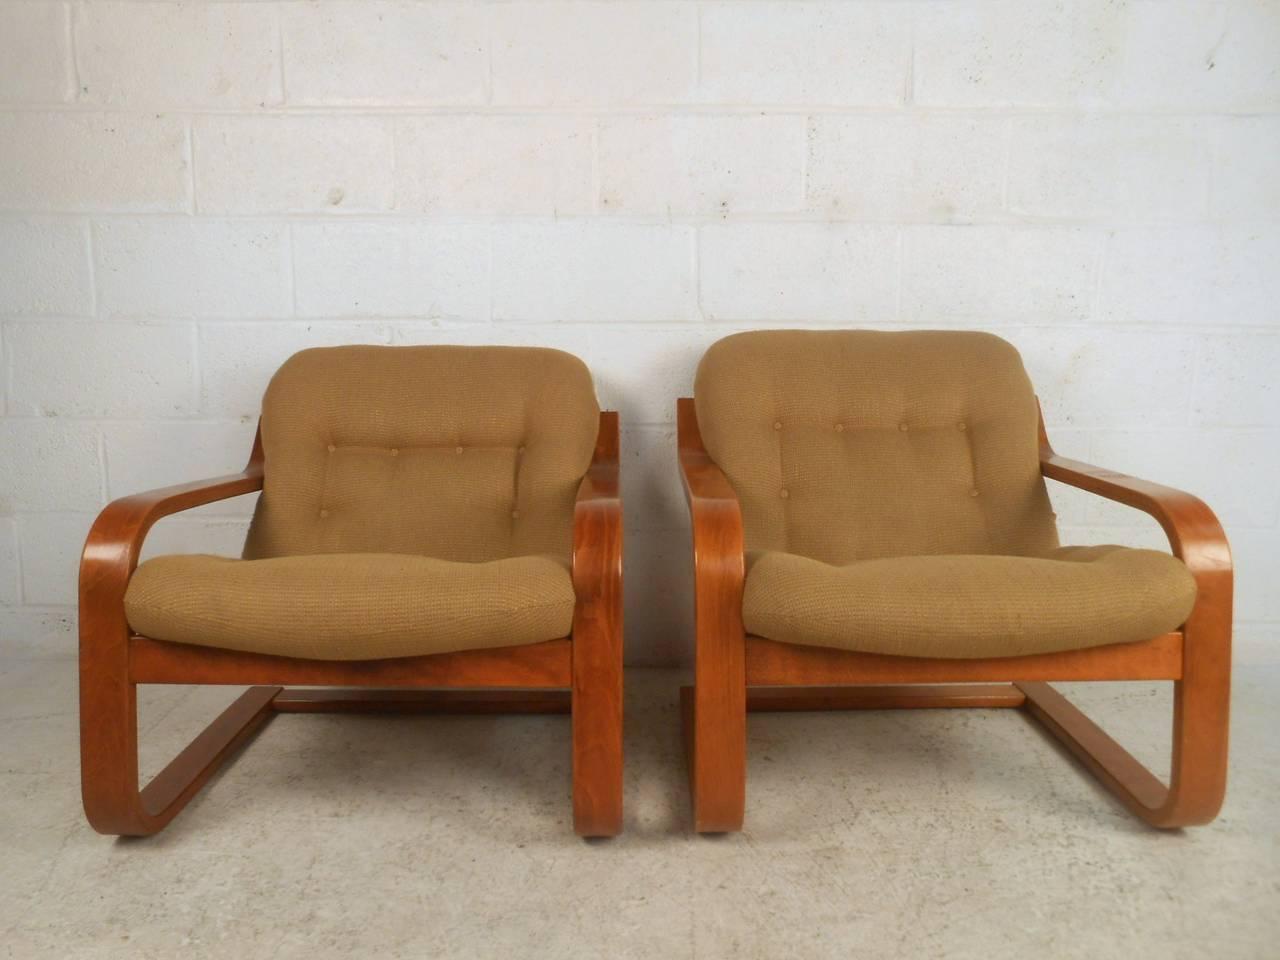 pair of midcentury scandinavian modern westnofa bentwood lounge